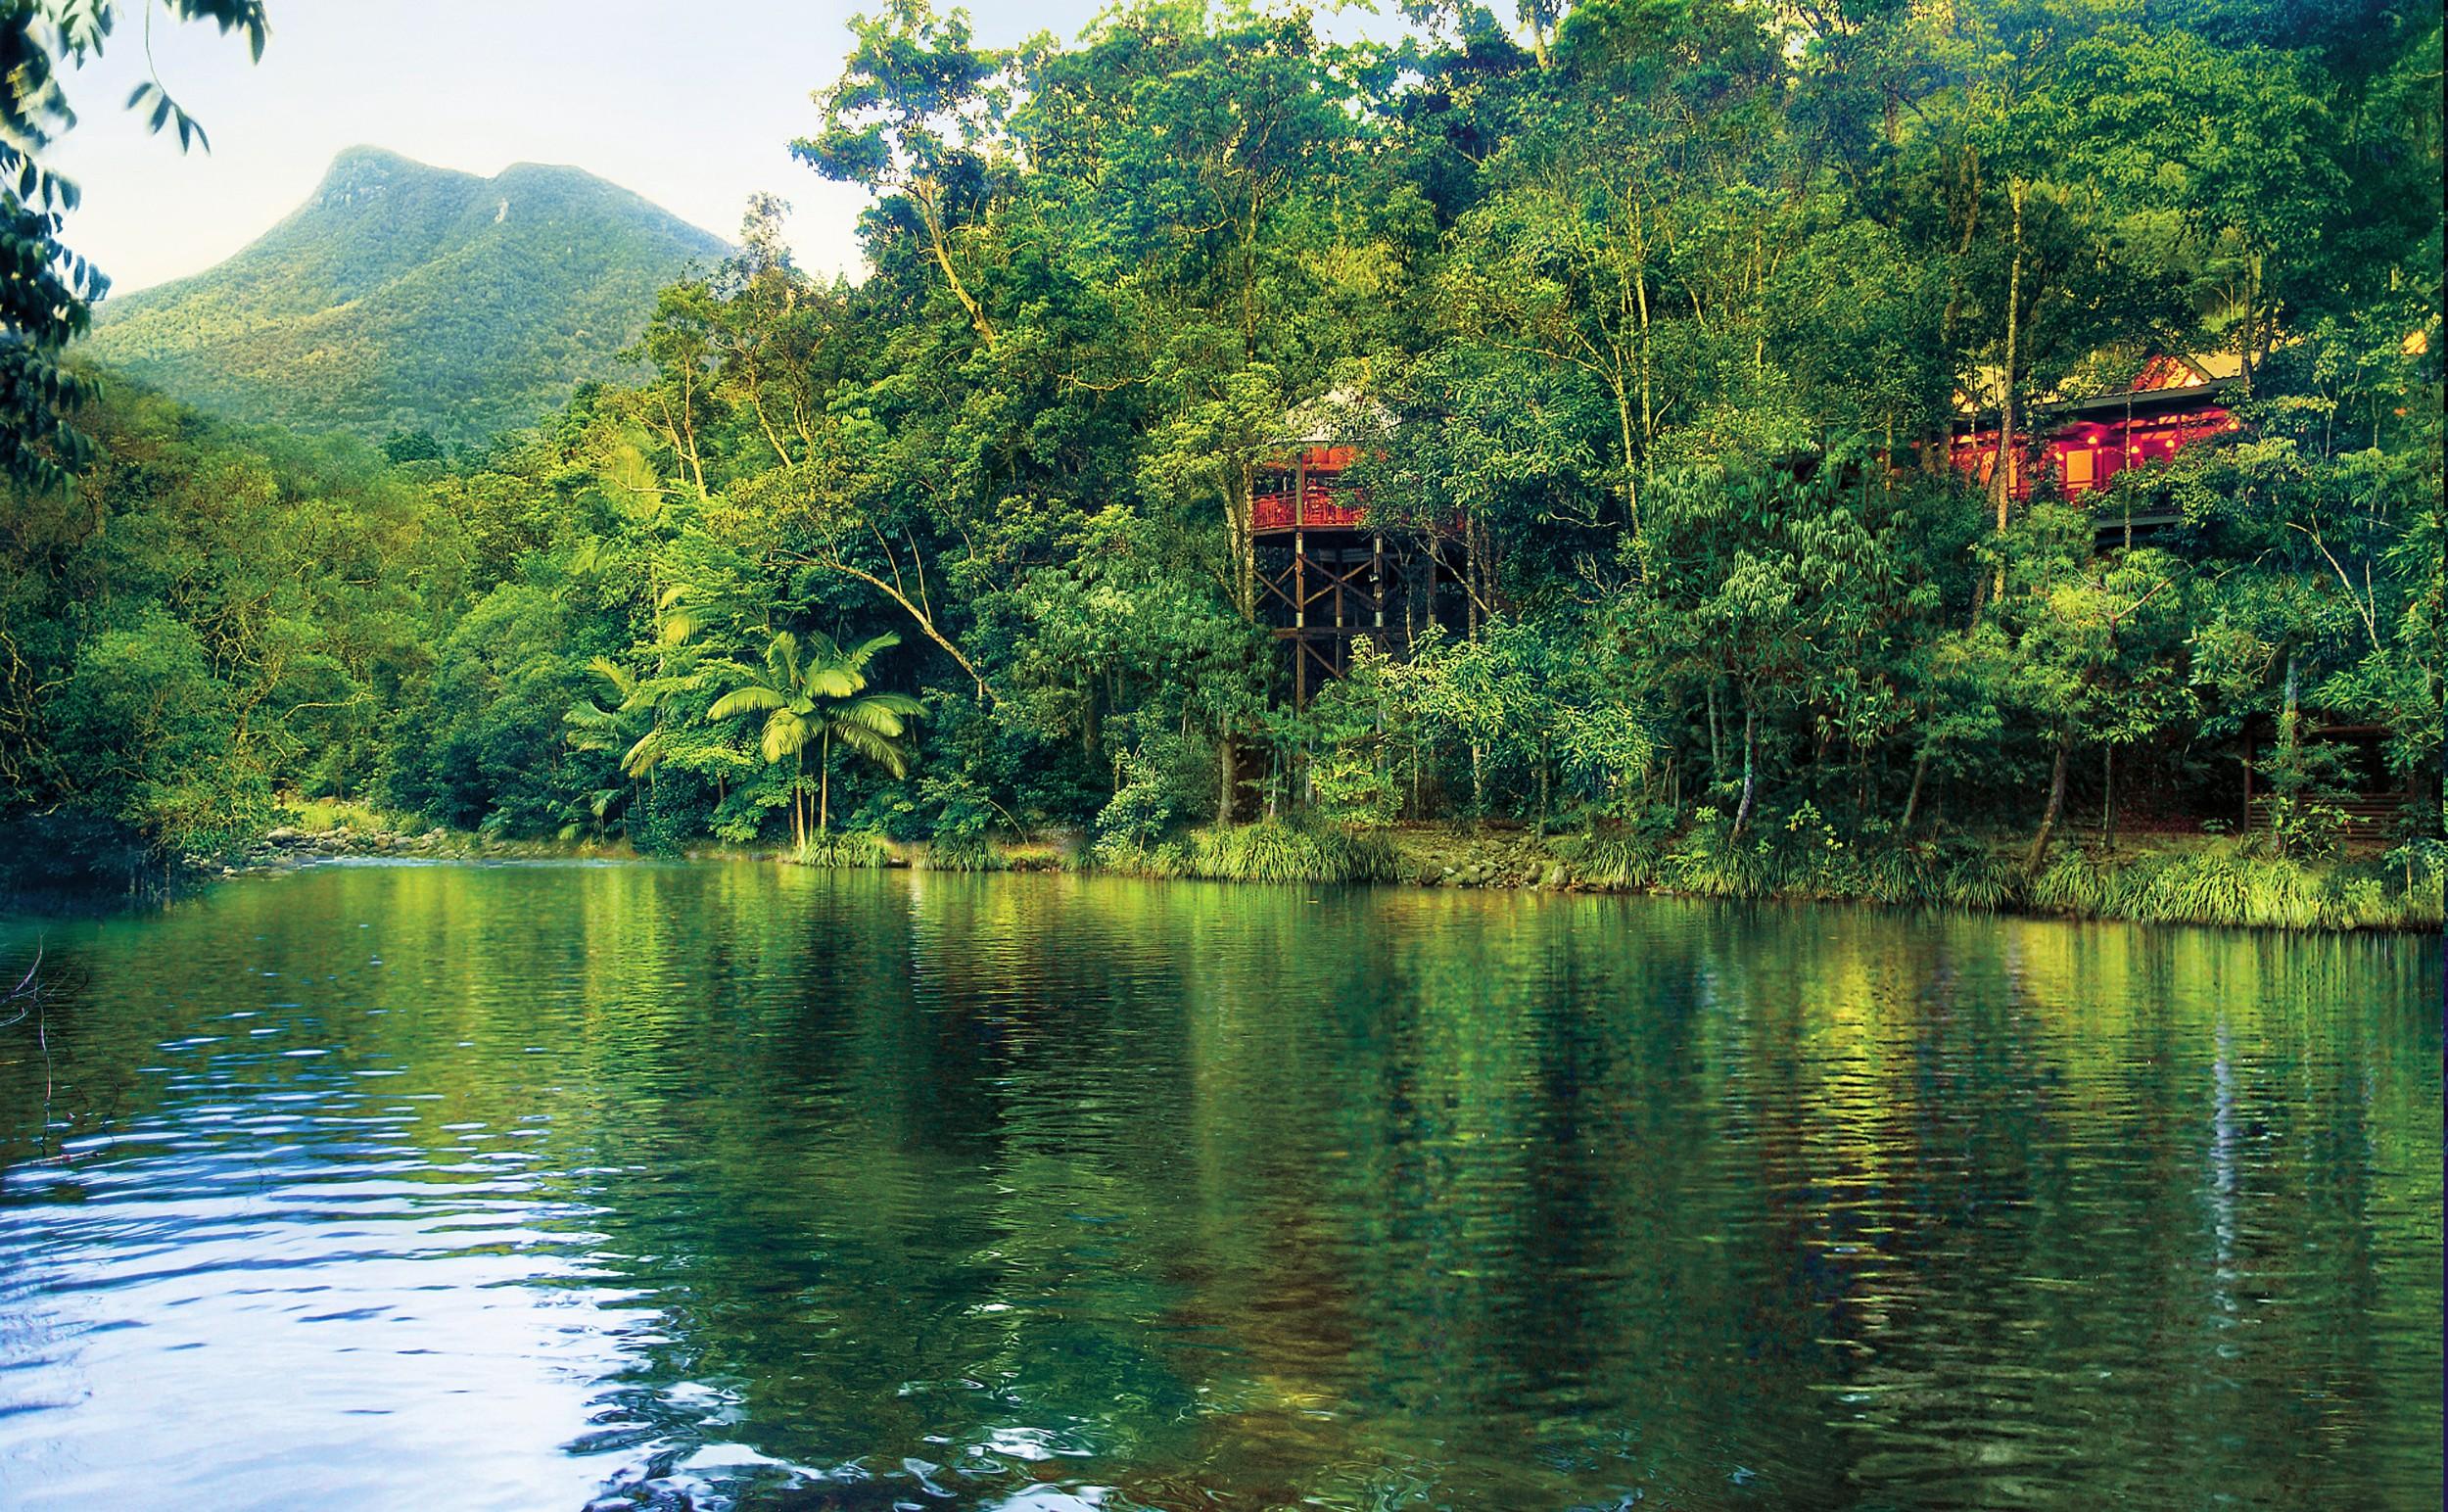 Silky-Oaks-Lodge-The-Daintree-River-Image-Hero.jpg